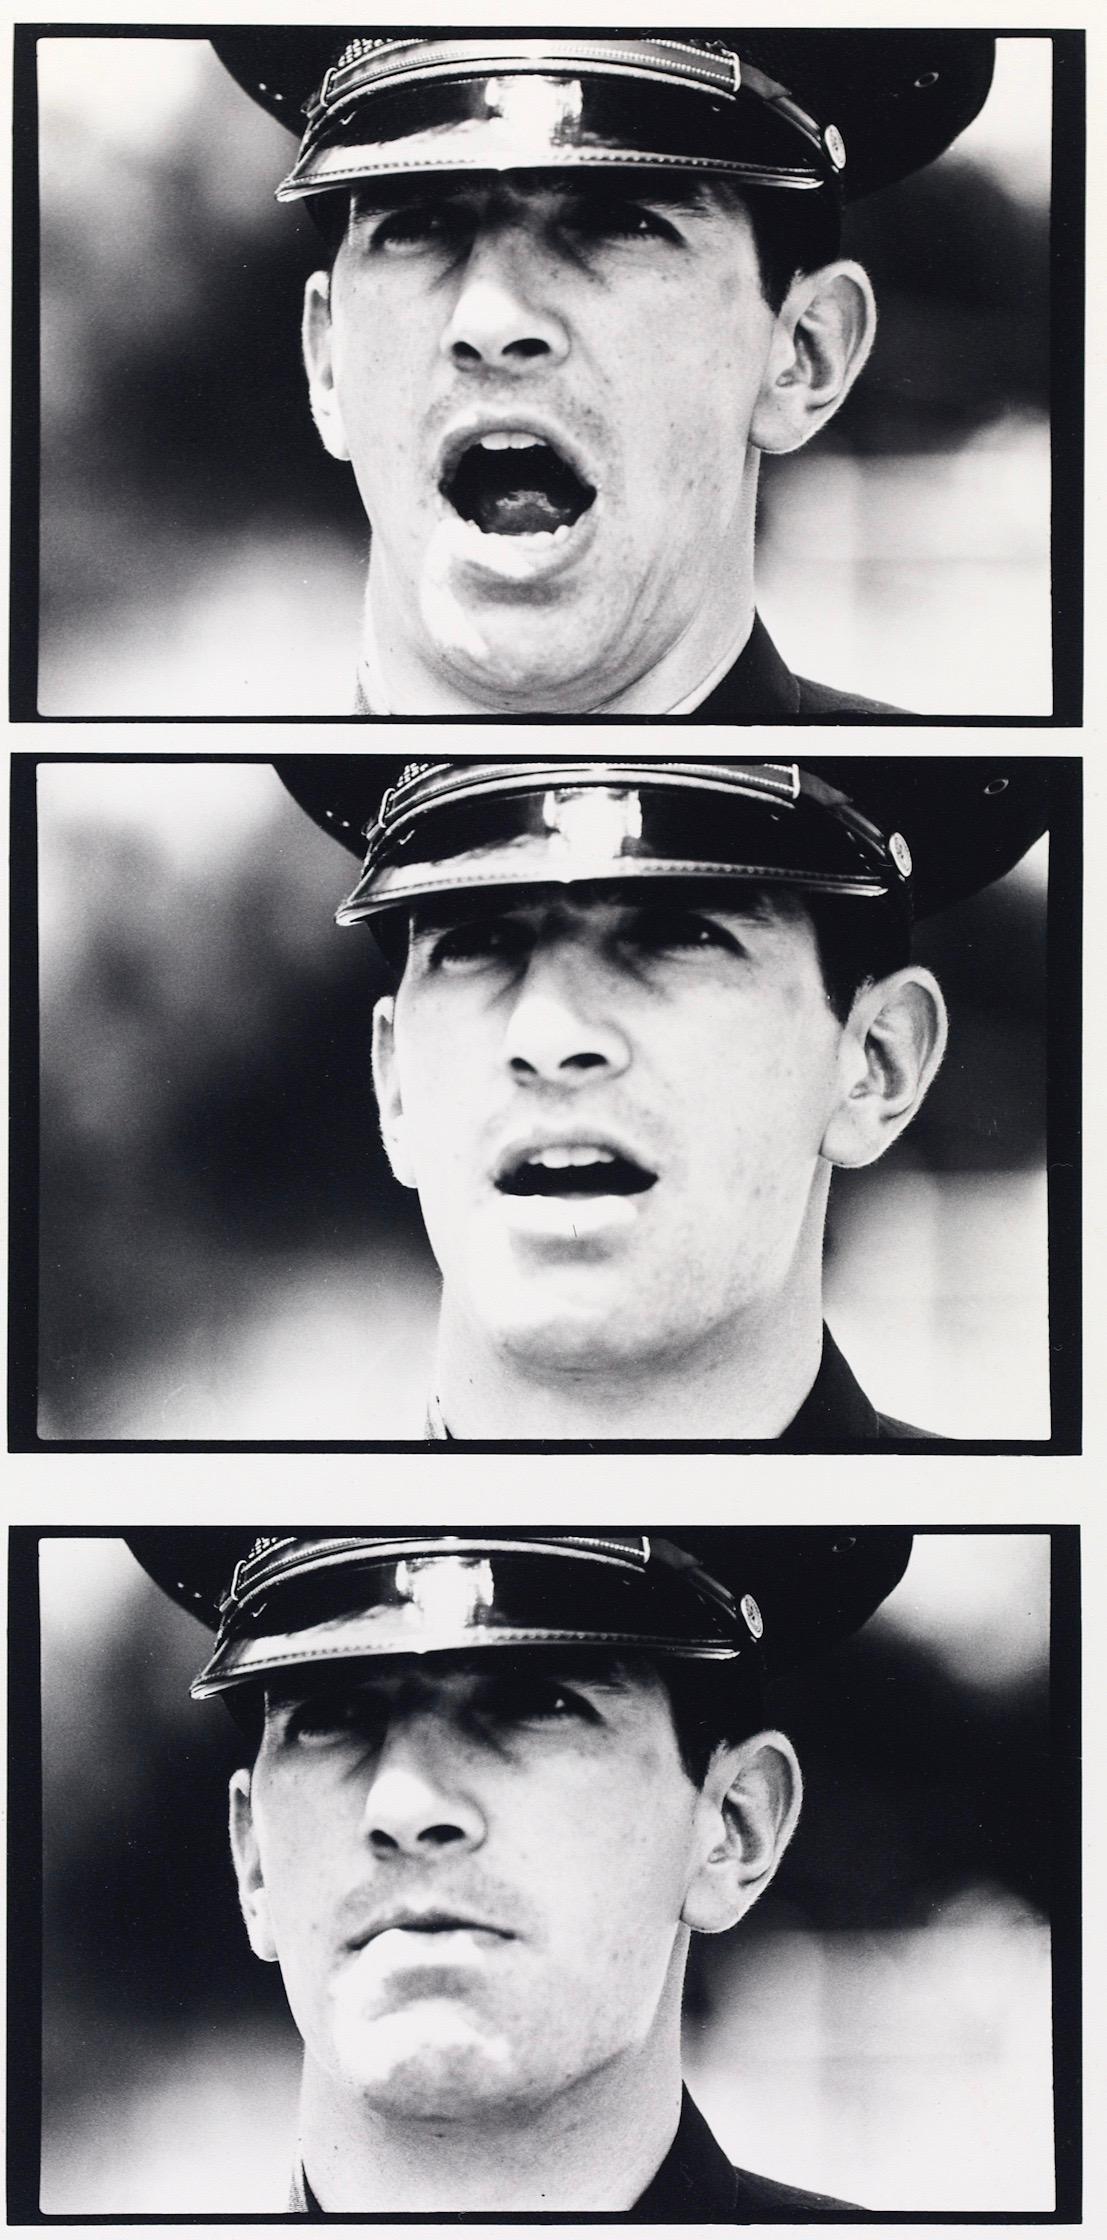 L.A. POLICE ACADEMY (1979-1980)